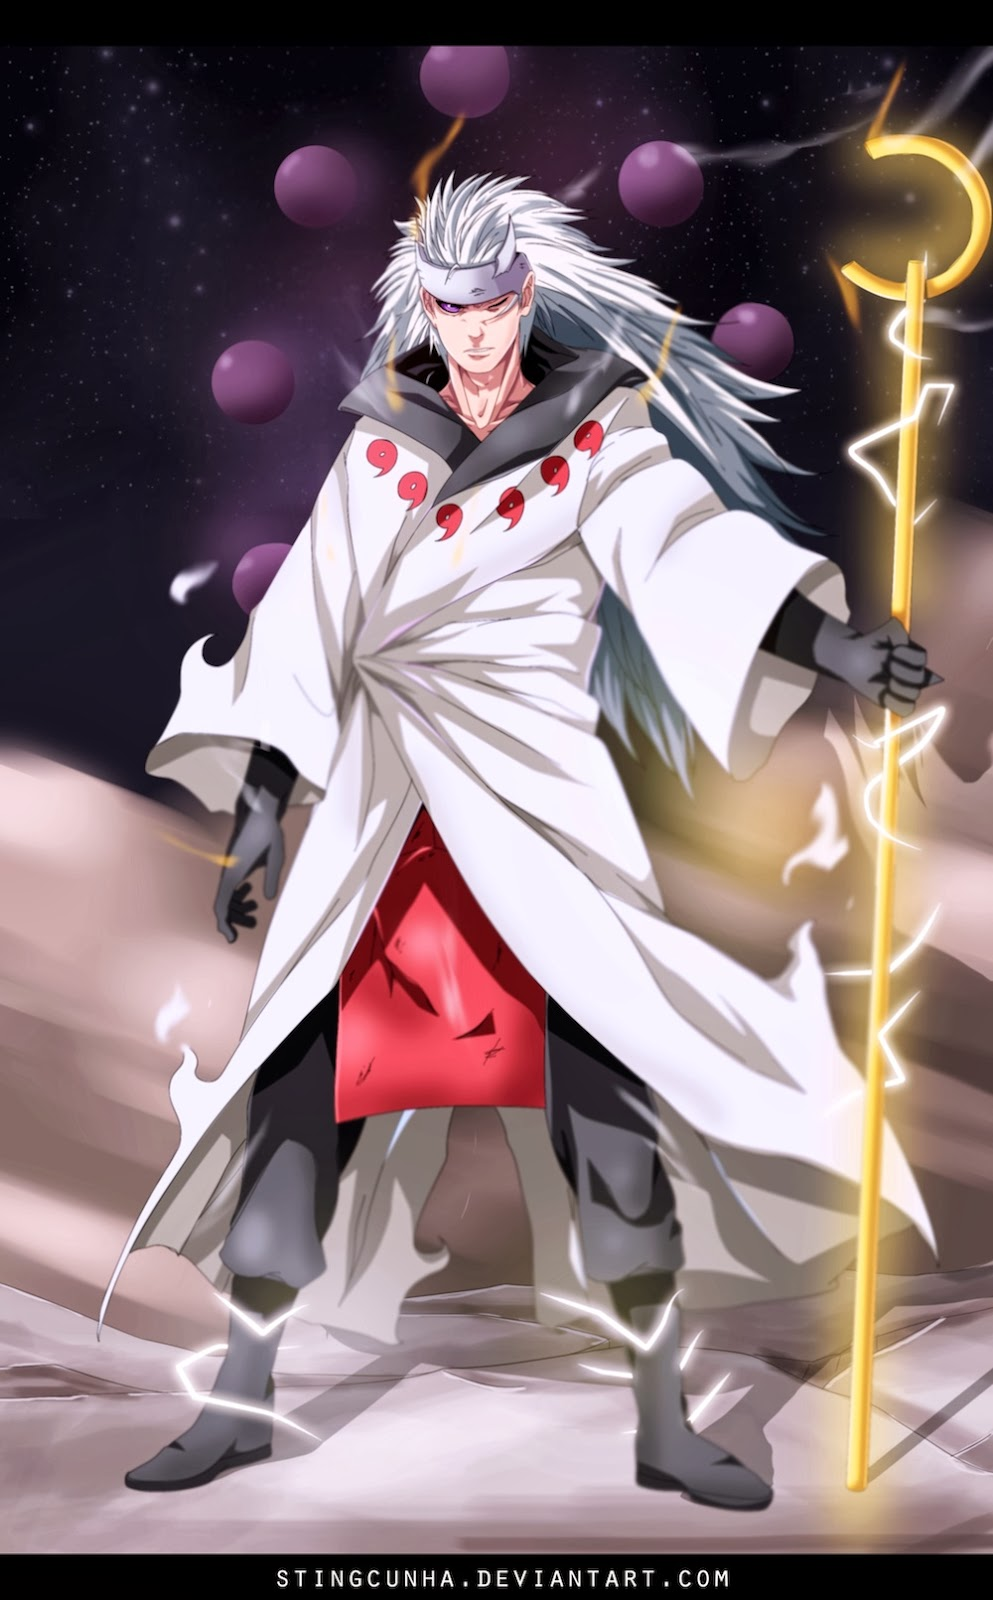 Imagenes De Naruto Rikudou Sennin | Search Results | Calendar 2015